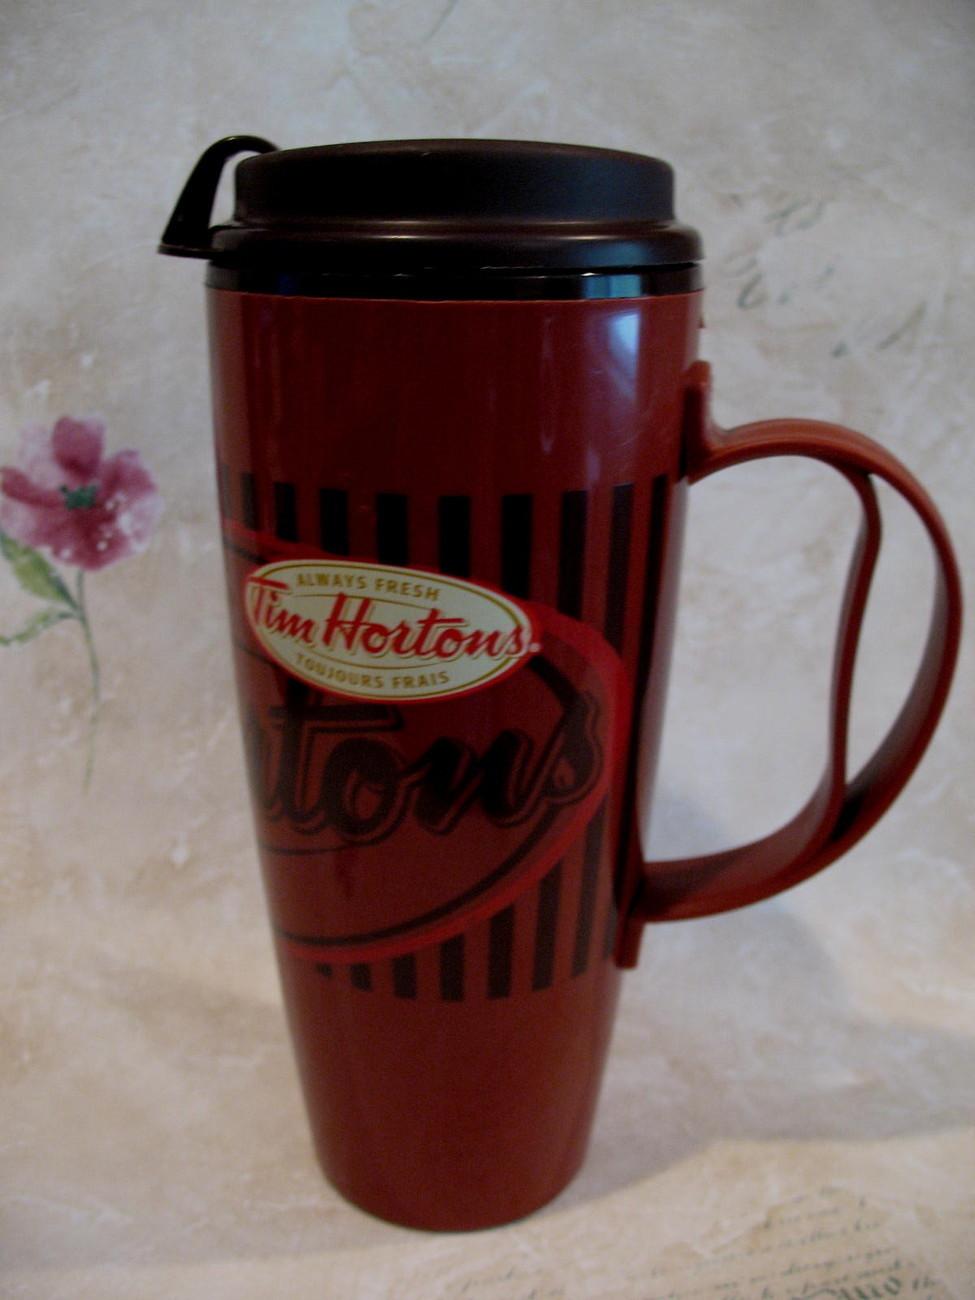 Tim Hortons Coffee Travel Cup Mug Always Fresh Souvenir ...